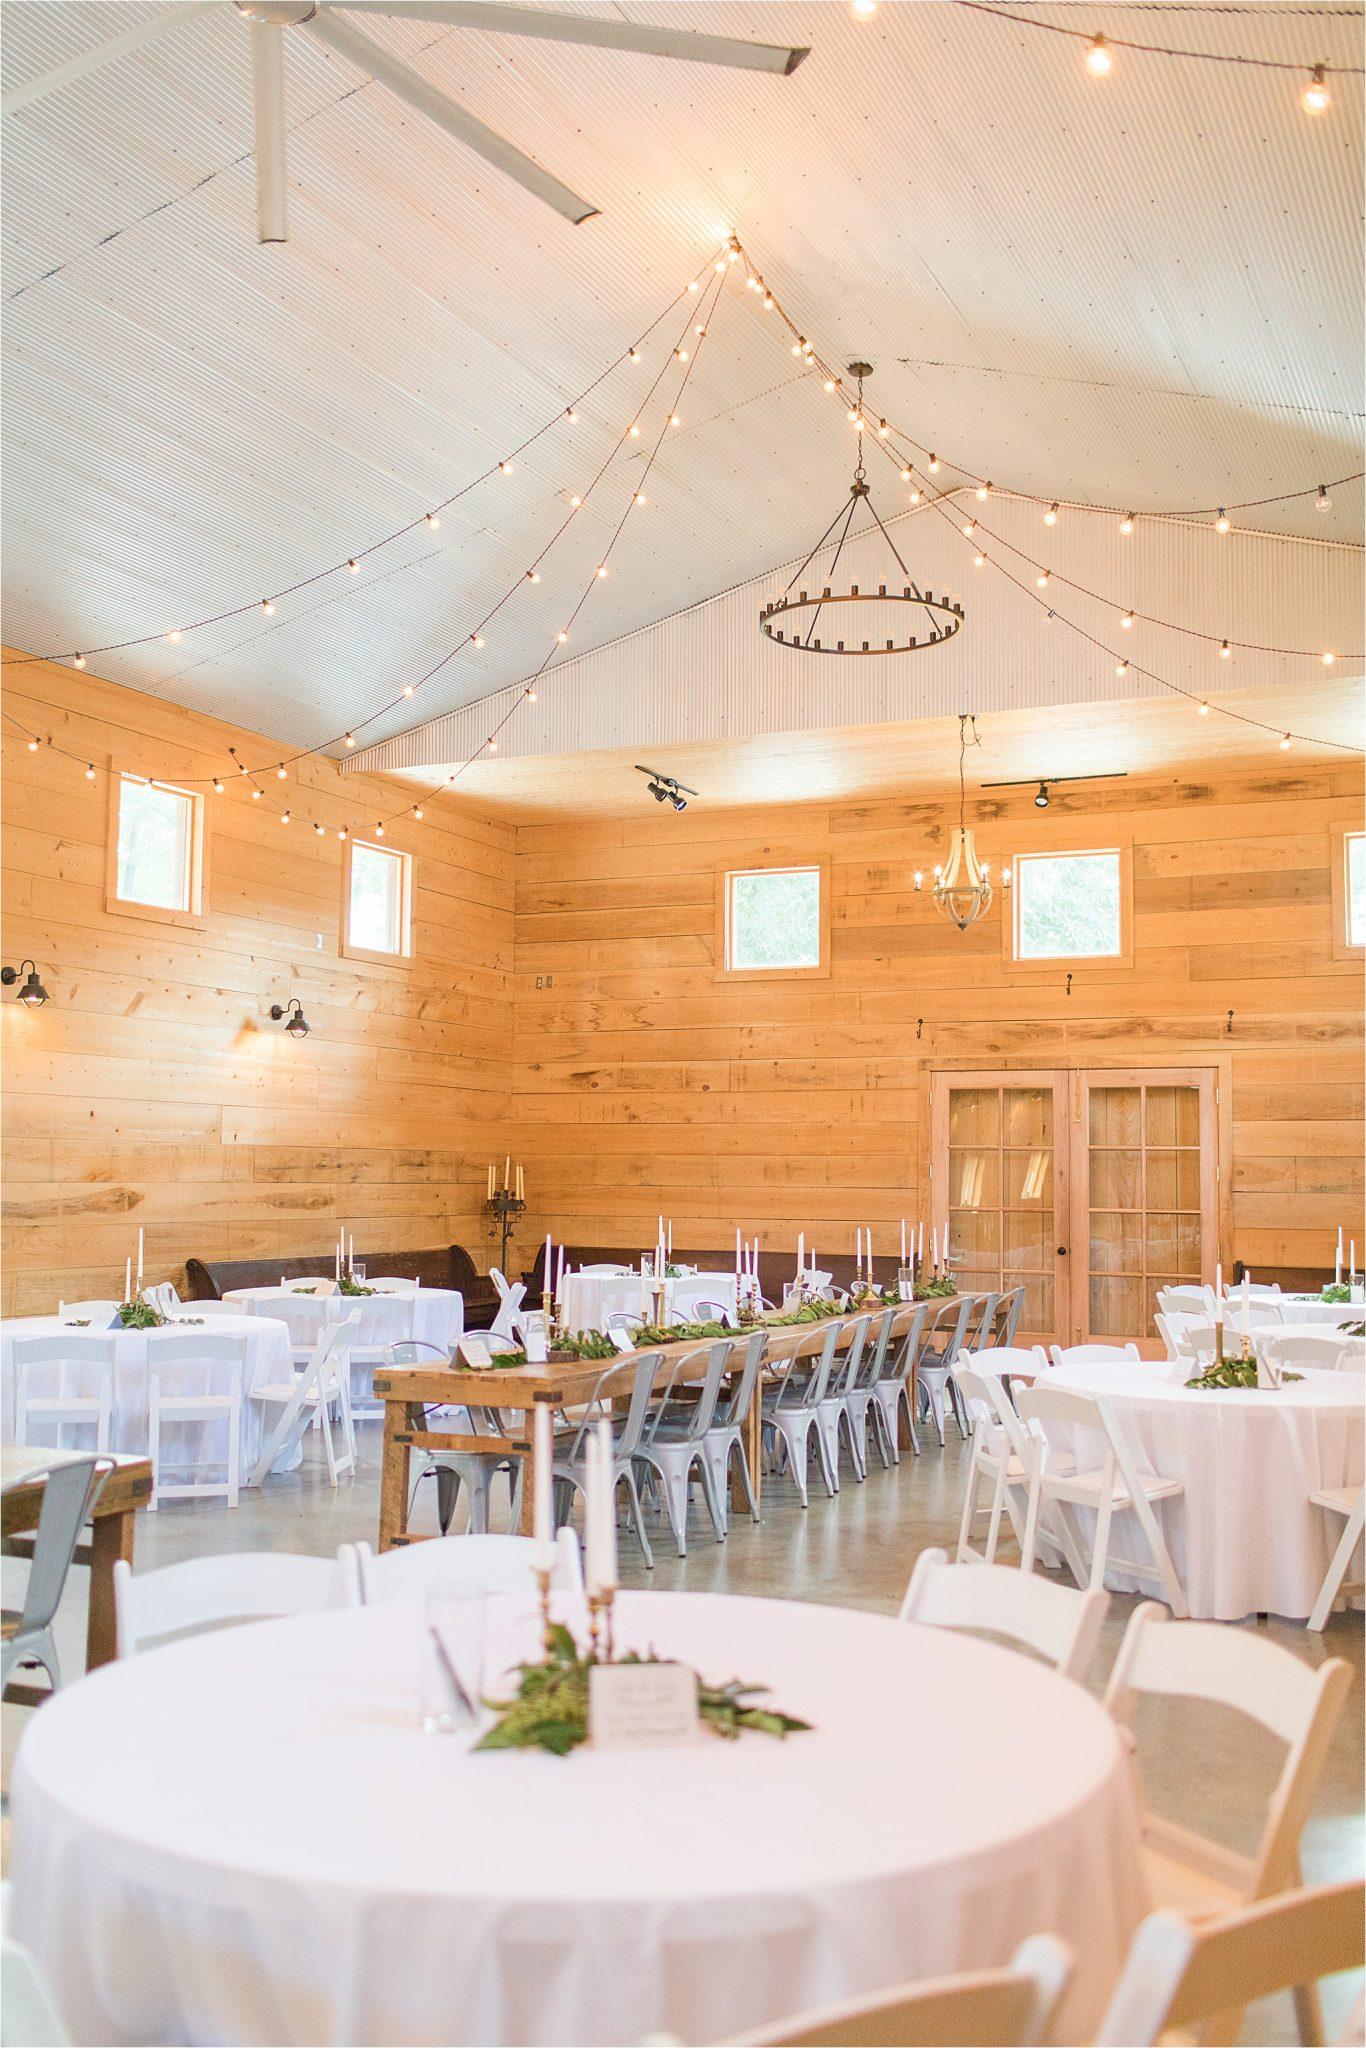 wedding-reception-alabama-venue-barn-hanging-lights-tables